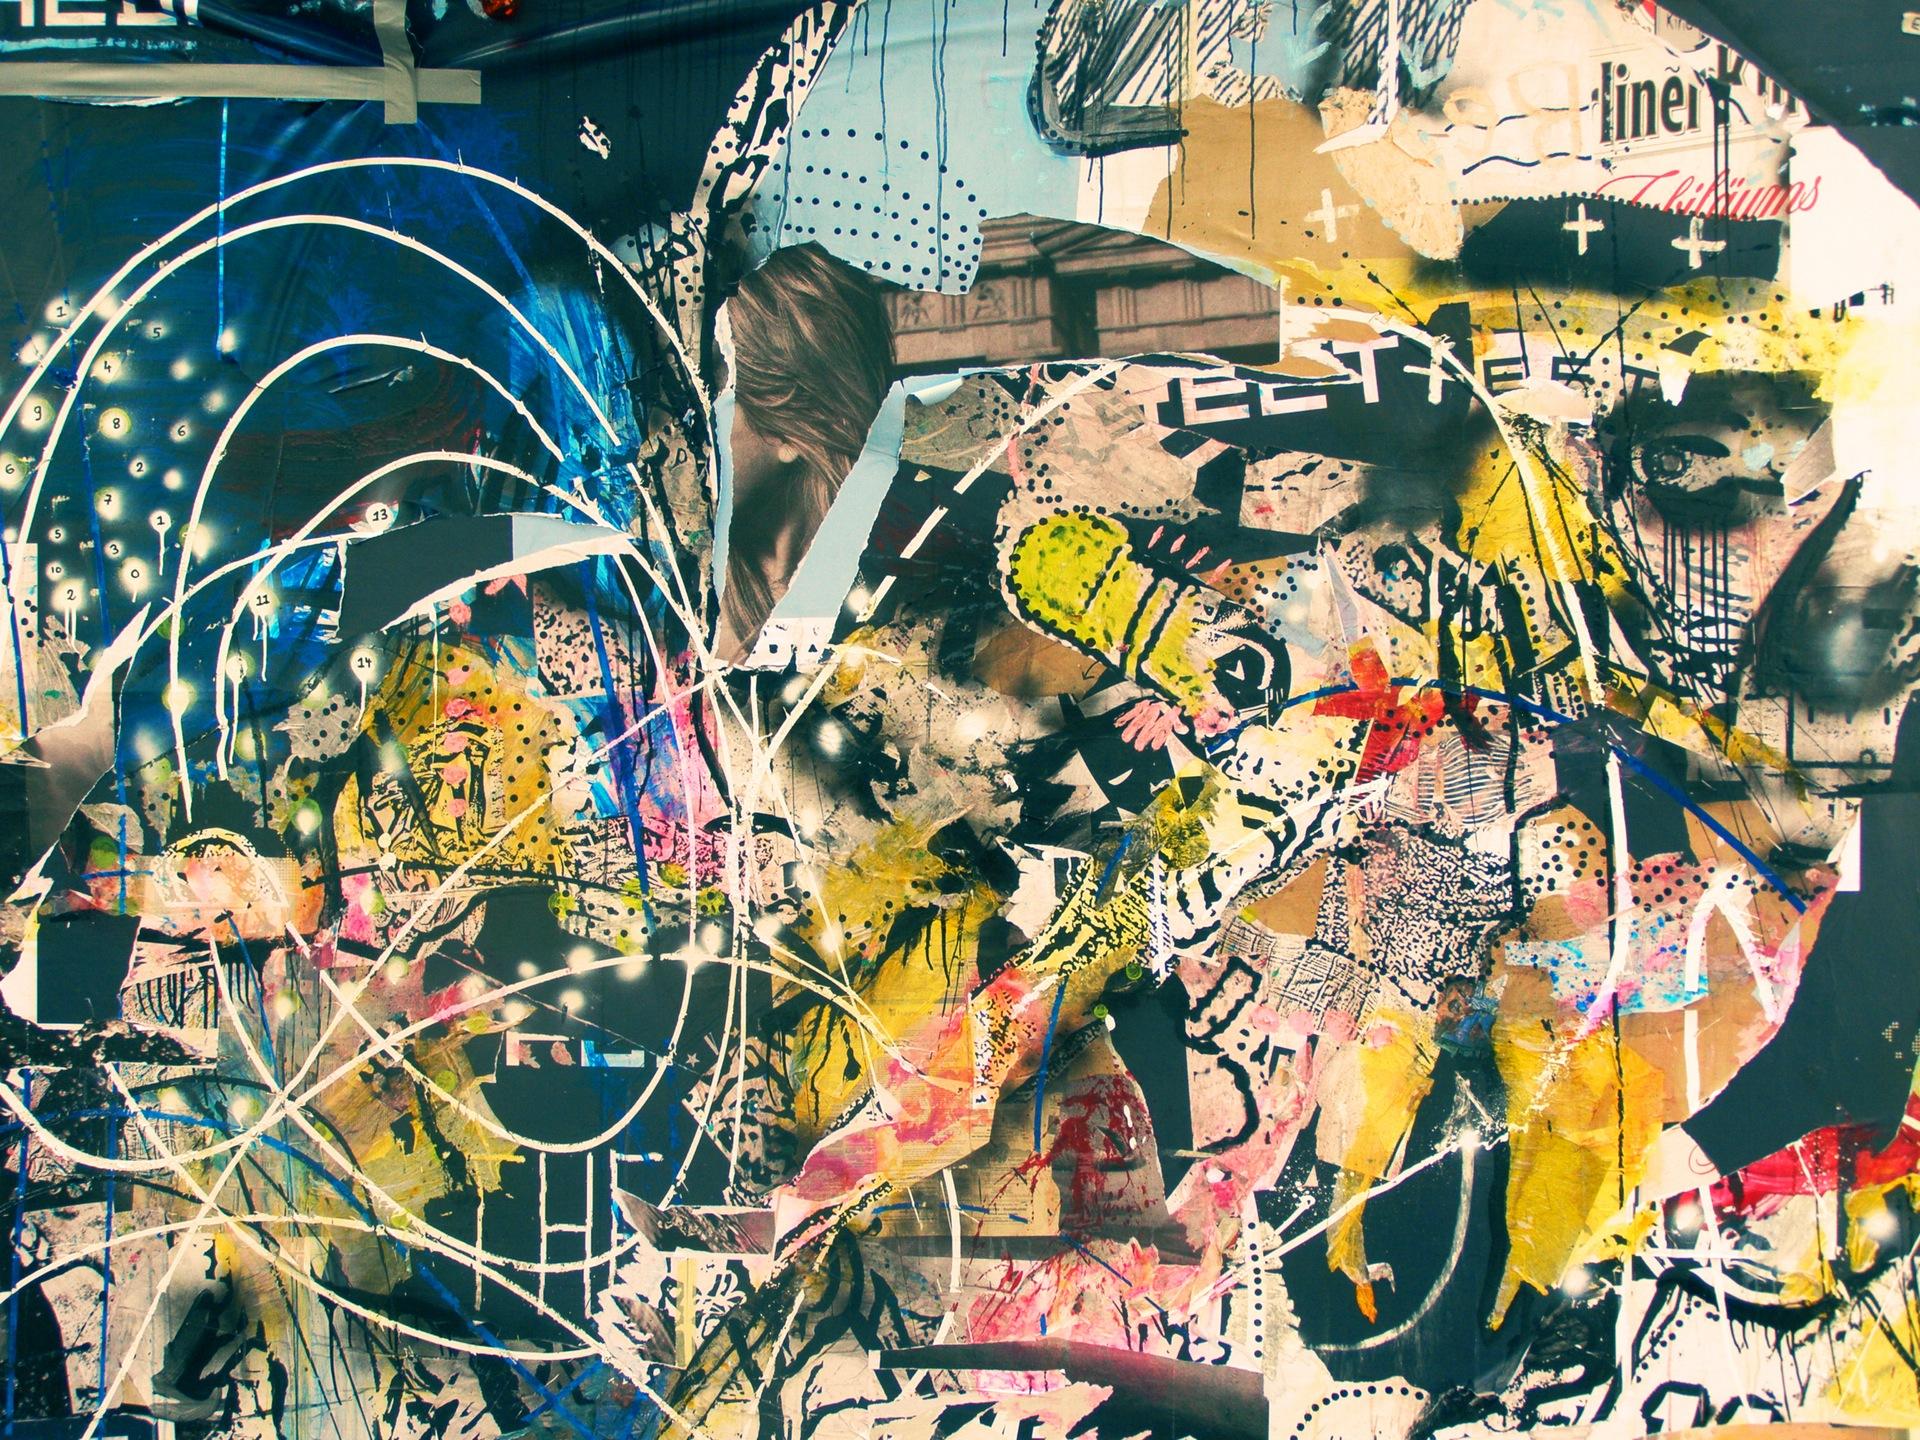 Graffiti, art, source d'inspiration, Rue, urbain - Fonds d'écran HD - Professor-falken.com